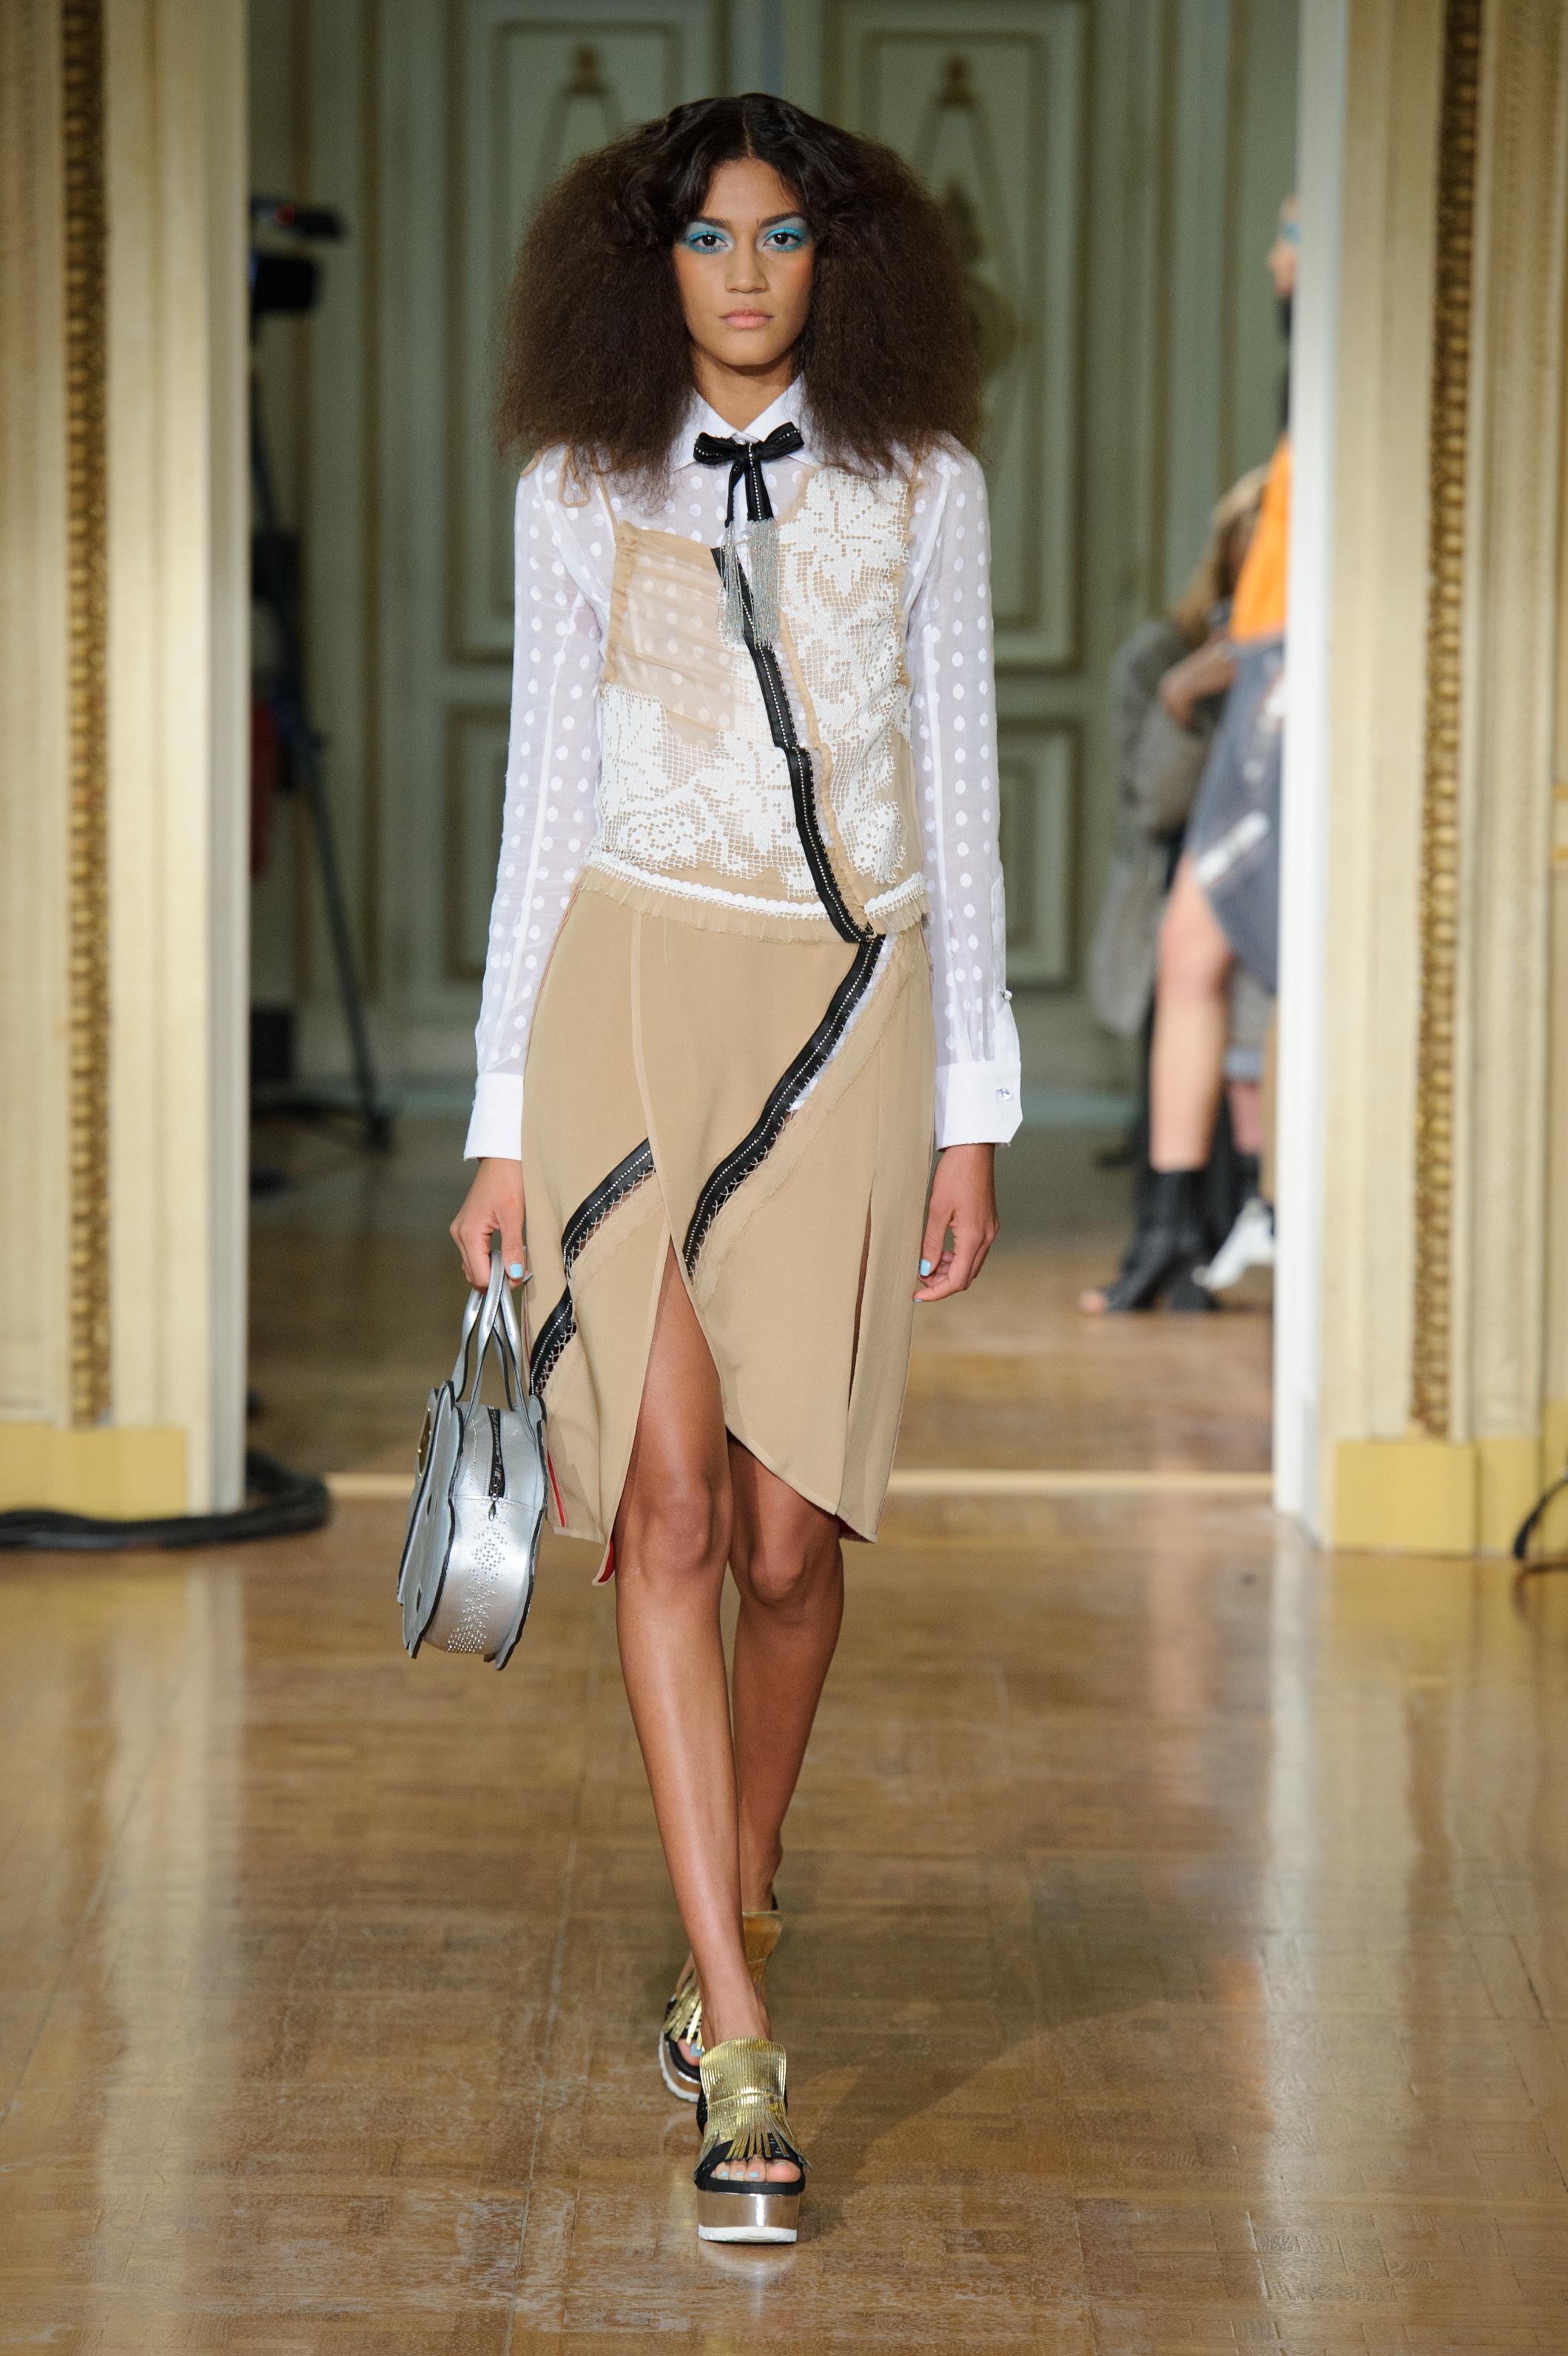 ANTONIO ORTEGA Couture Presents Paris Haute Couture Fashion Week